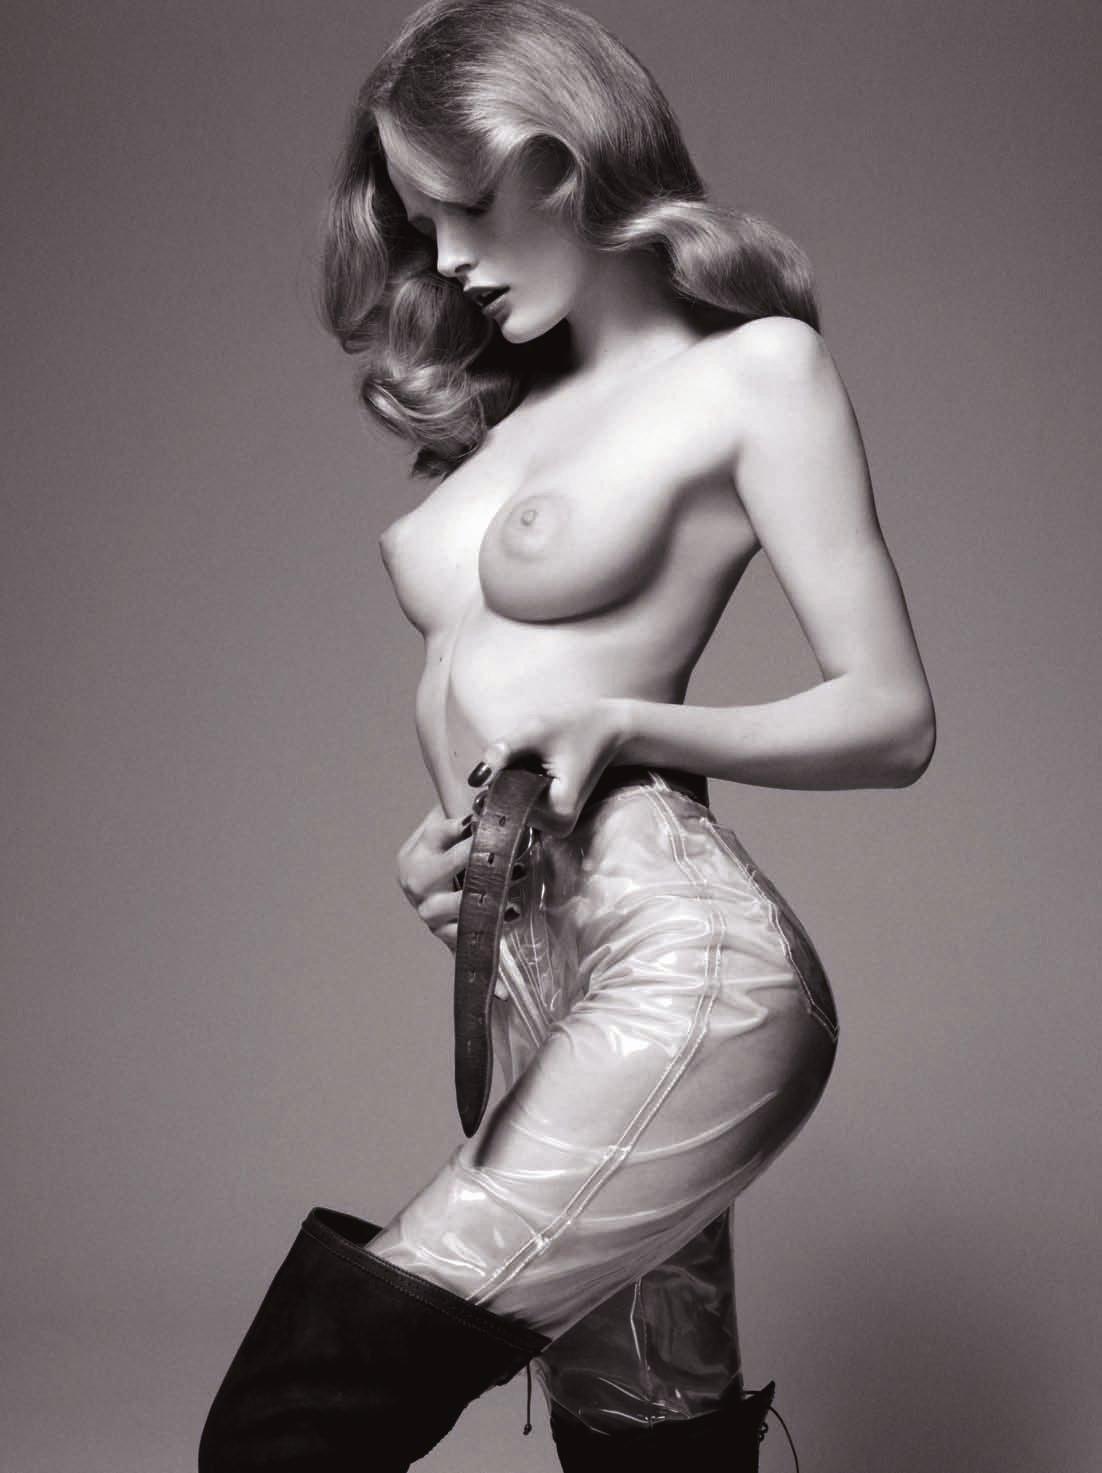 Edita vilkeviciute nude